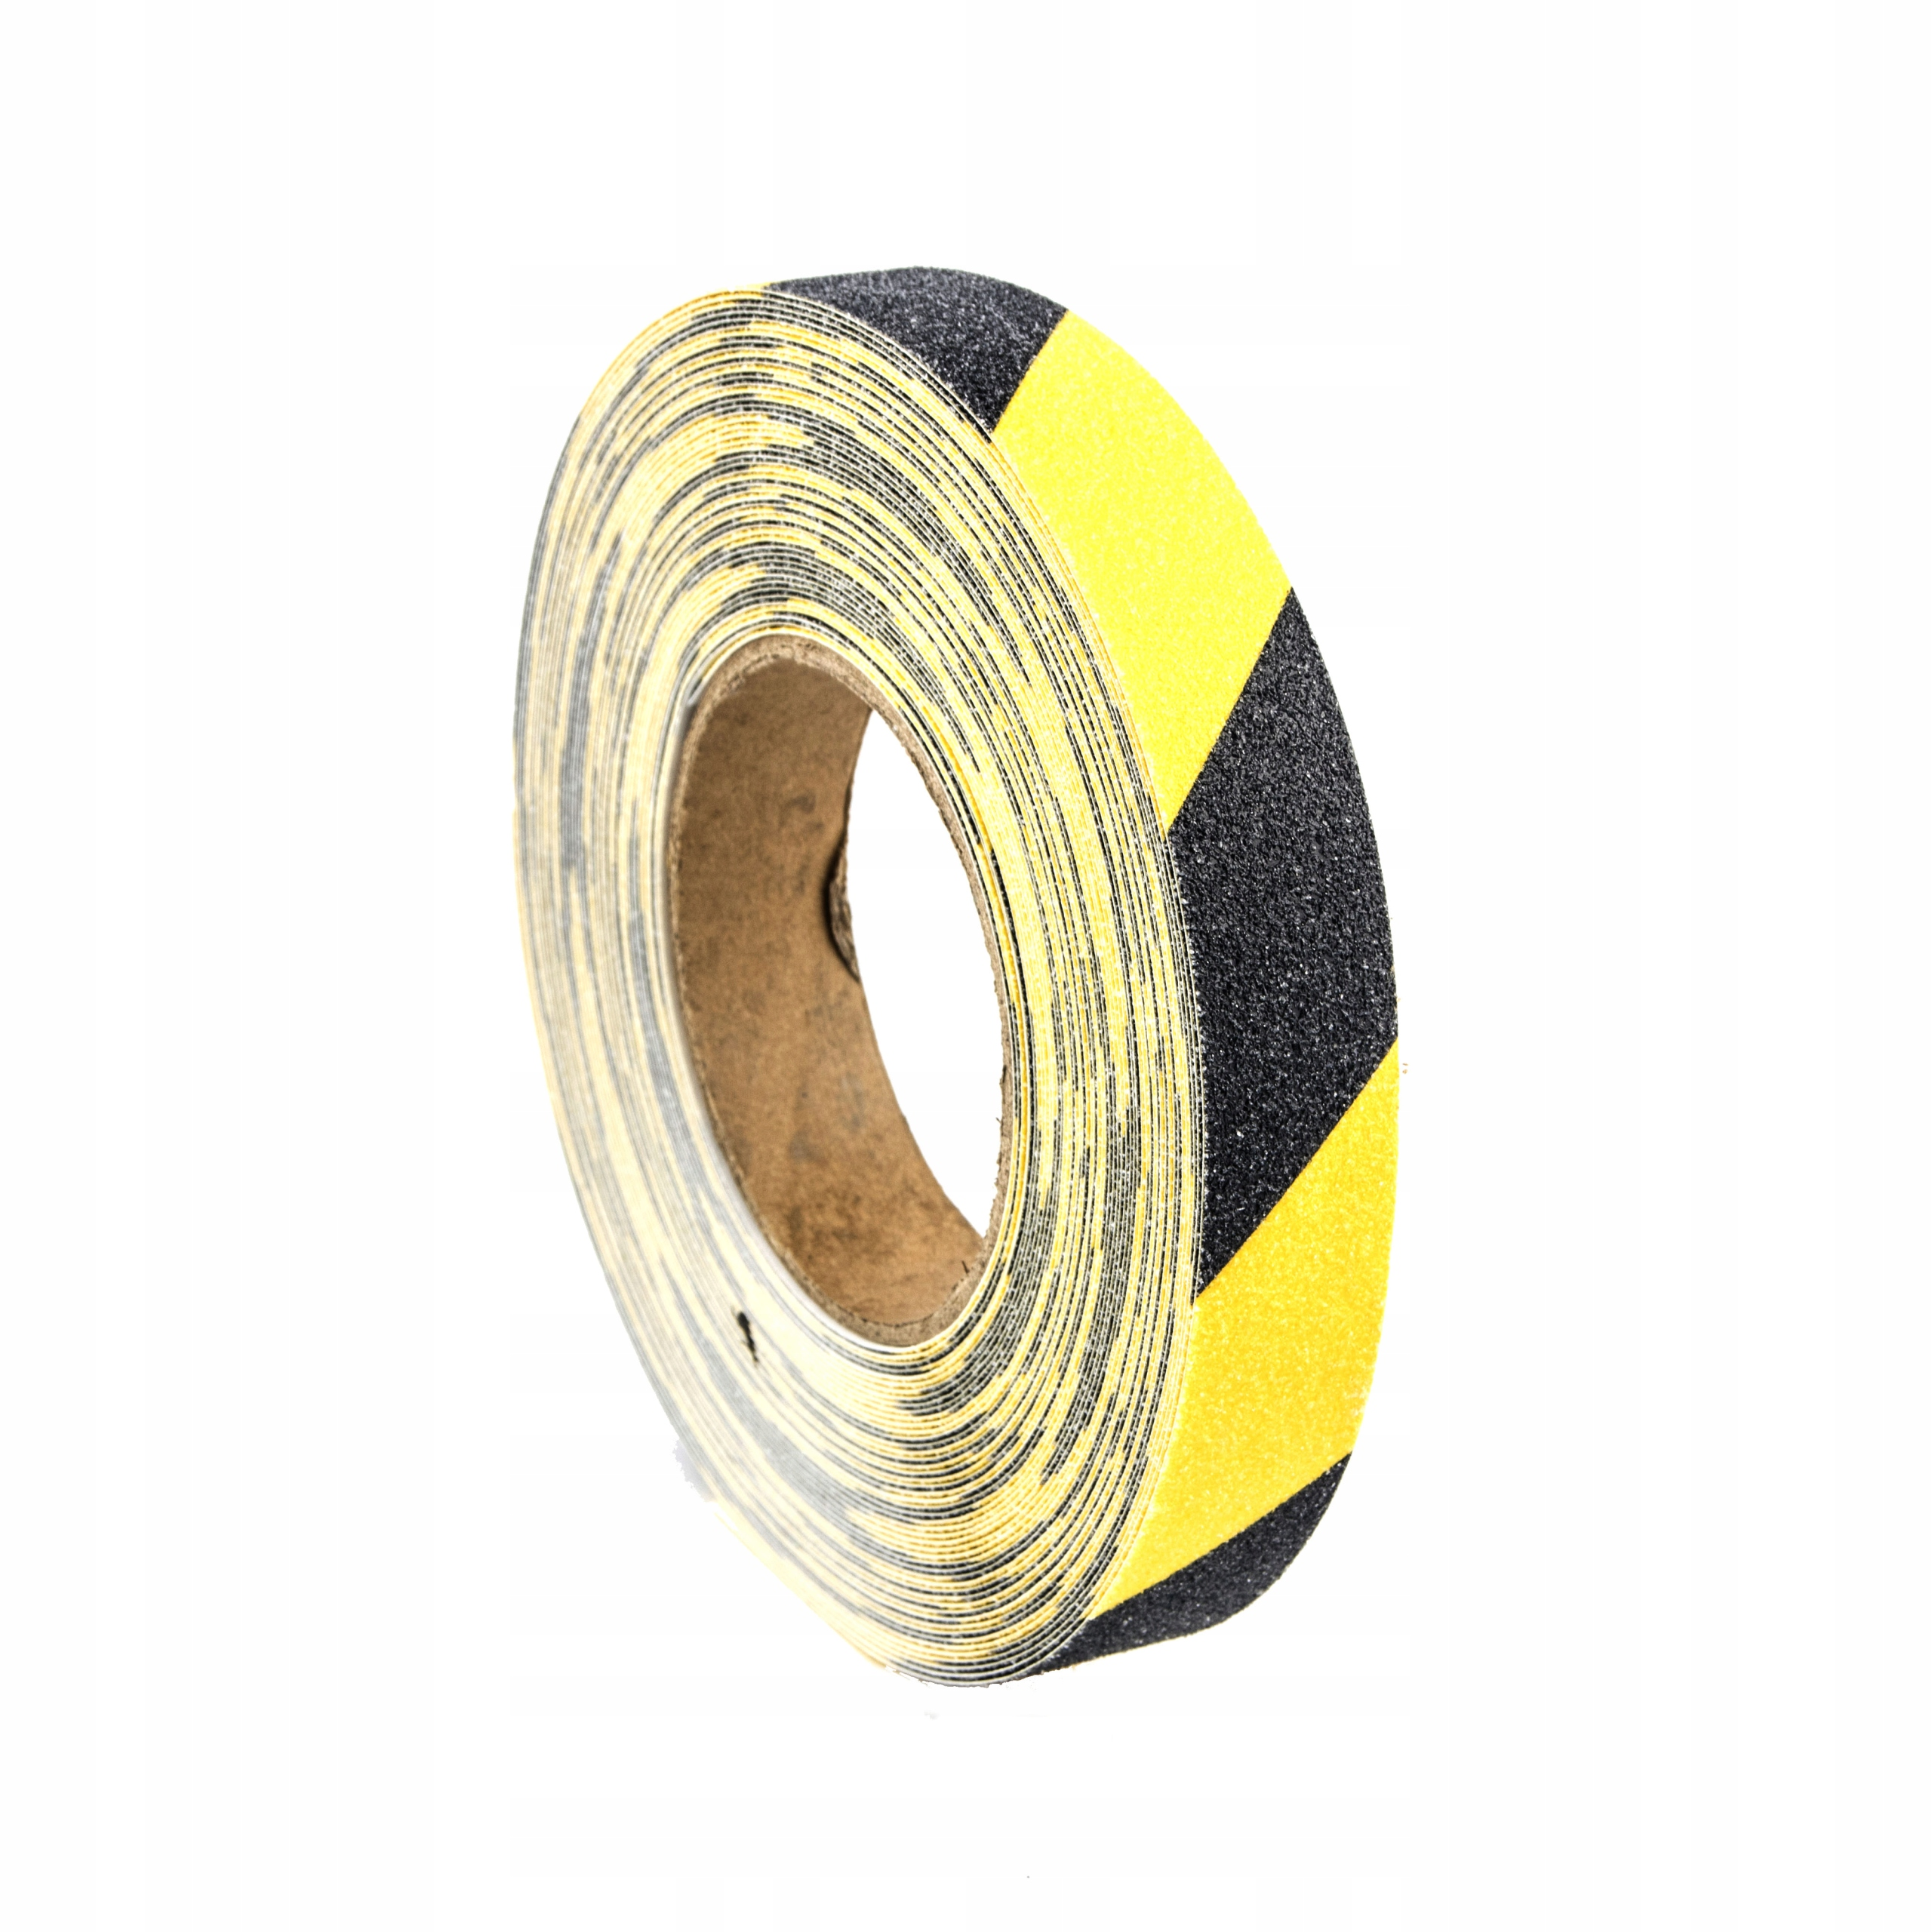 NON-SLIP ADHESIVE TAPE 25mm x18m желтый